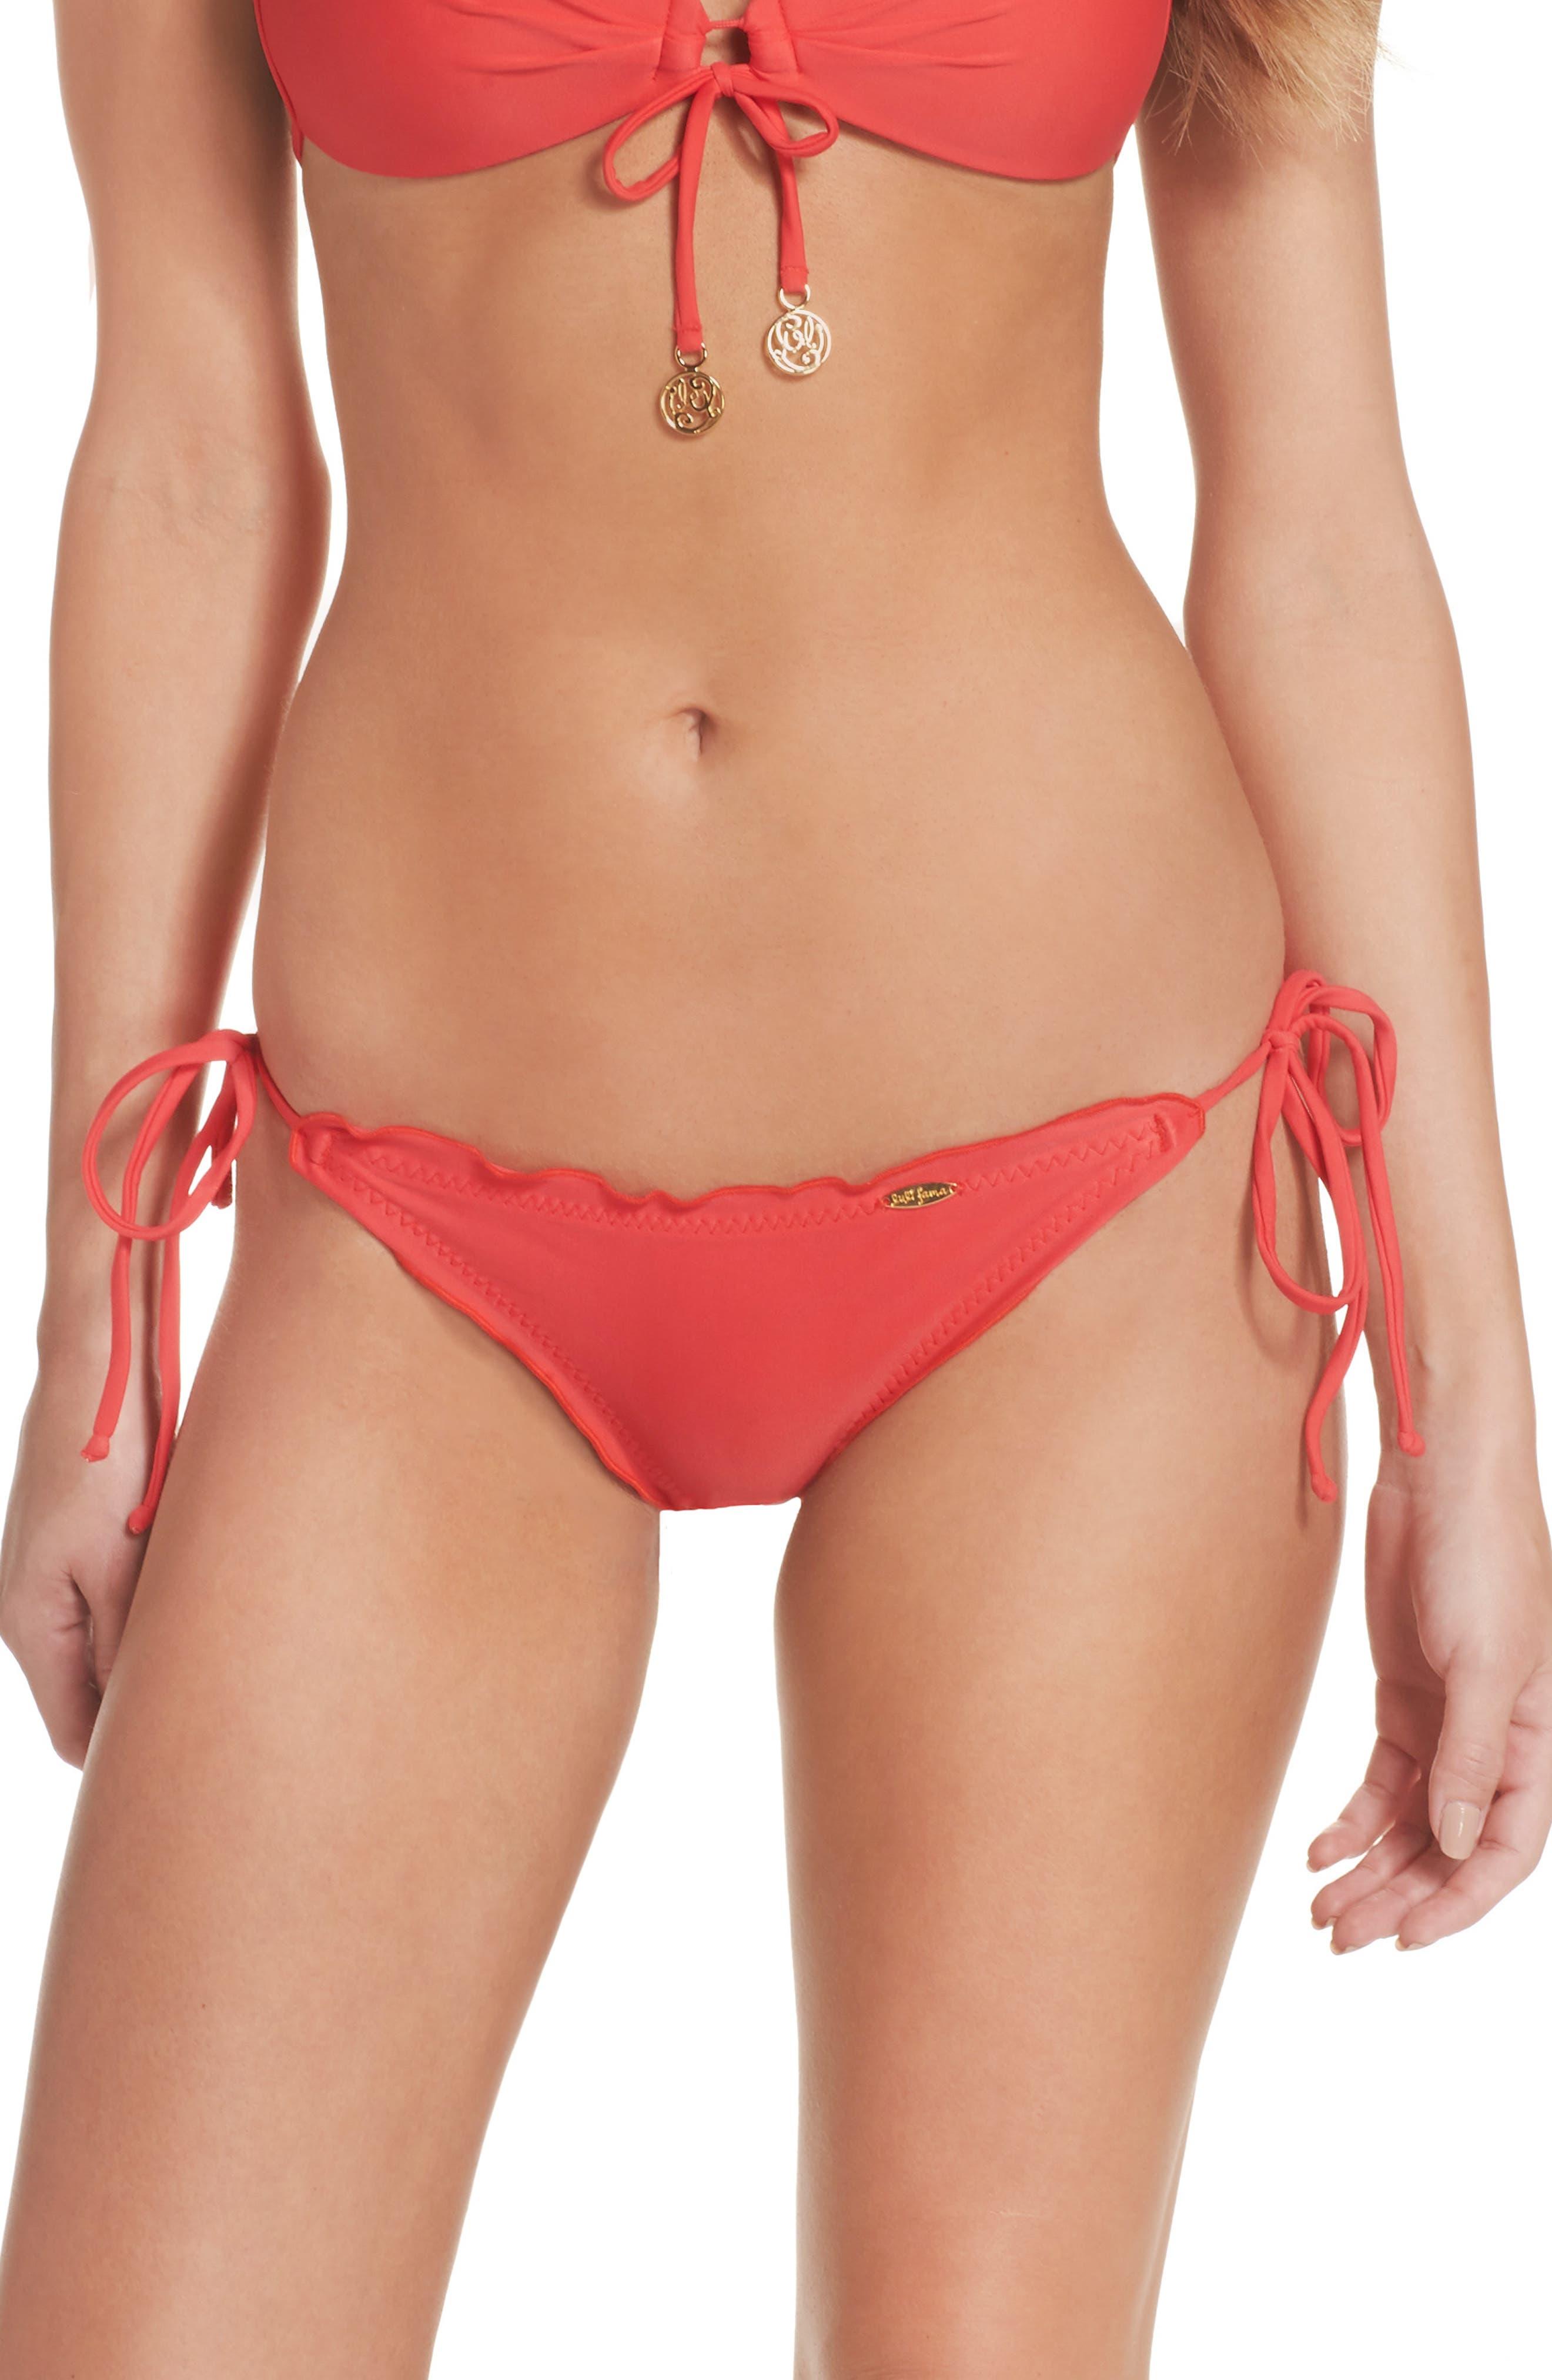 Alternate Image 2  - Luli Fama 'Wavy' Brazilian Side Tie Bikini Bottoms